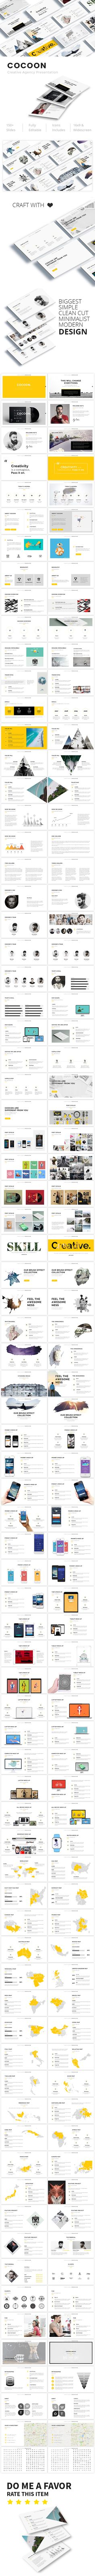 Cocoon - Creative Keynote Template